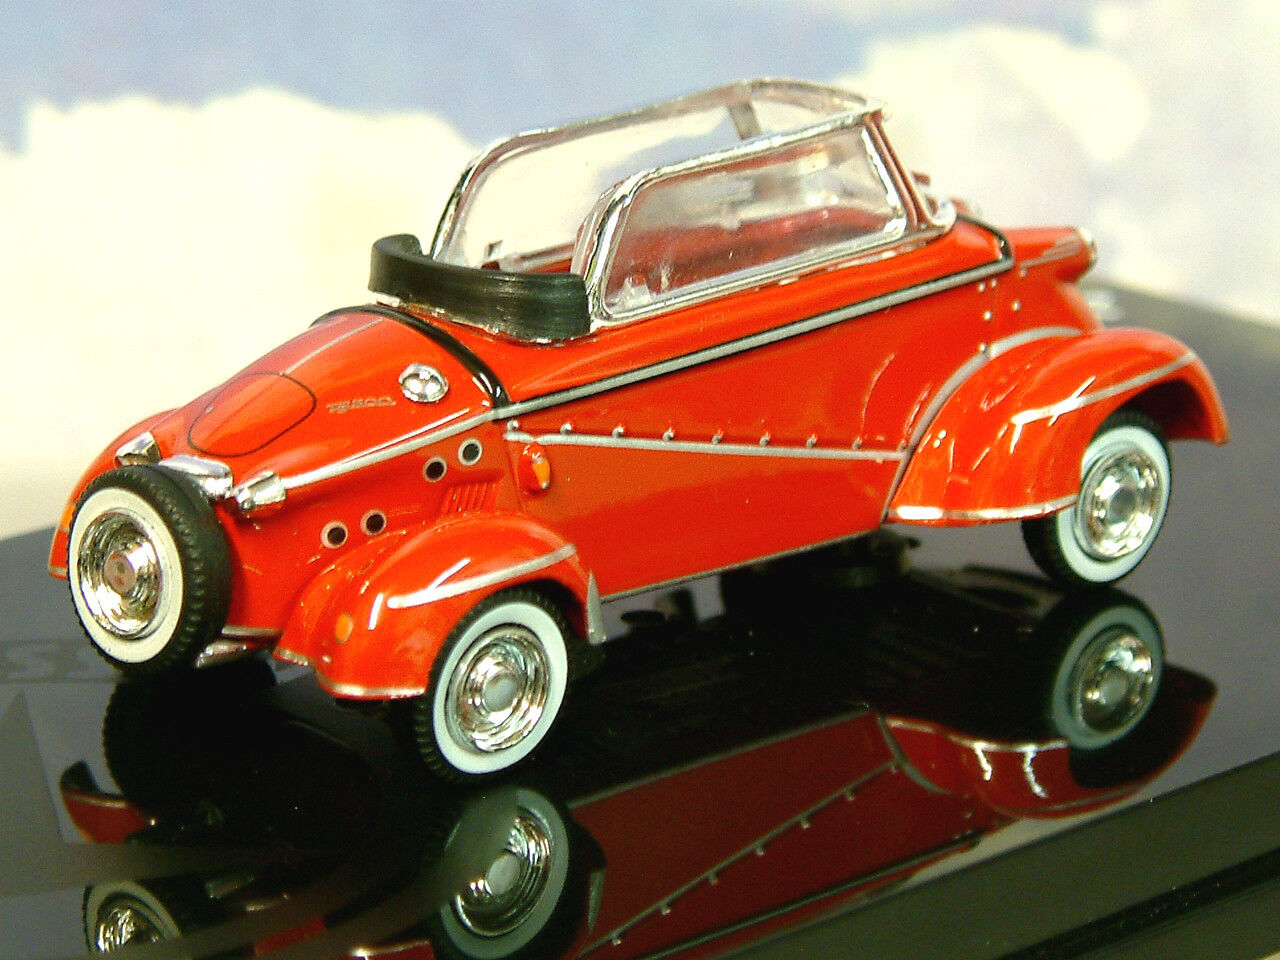 Vitesse de Metal 1 43 43 43 1958-61 Messerschmitt Tiger Tg500 Cabriolet en Rojo 29054 6d8609